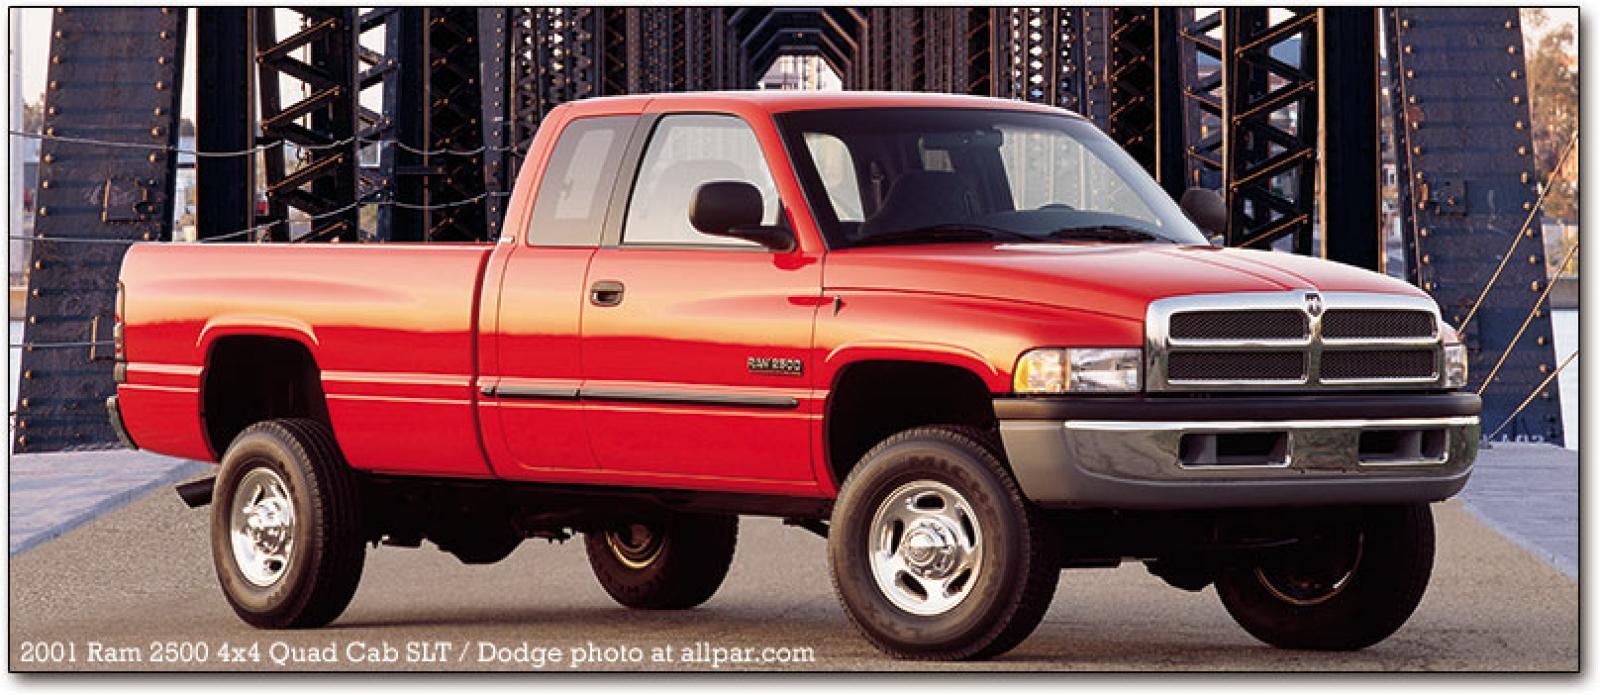 1996 Dodge Ram 1500 Slt Fuse Box Trusted Wiring Diagram 1995 Jeep Wrangler 1994 2001 Tj 2006